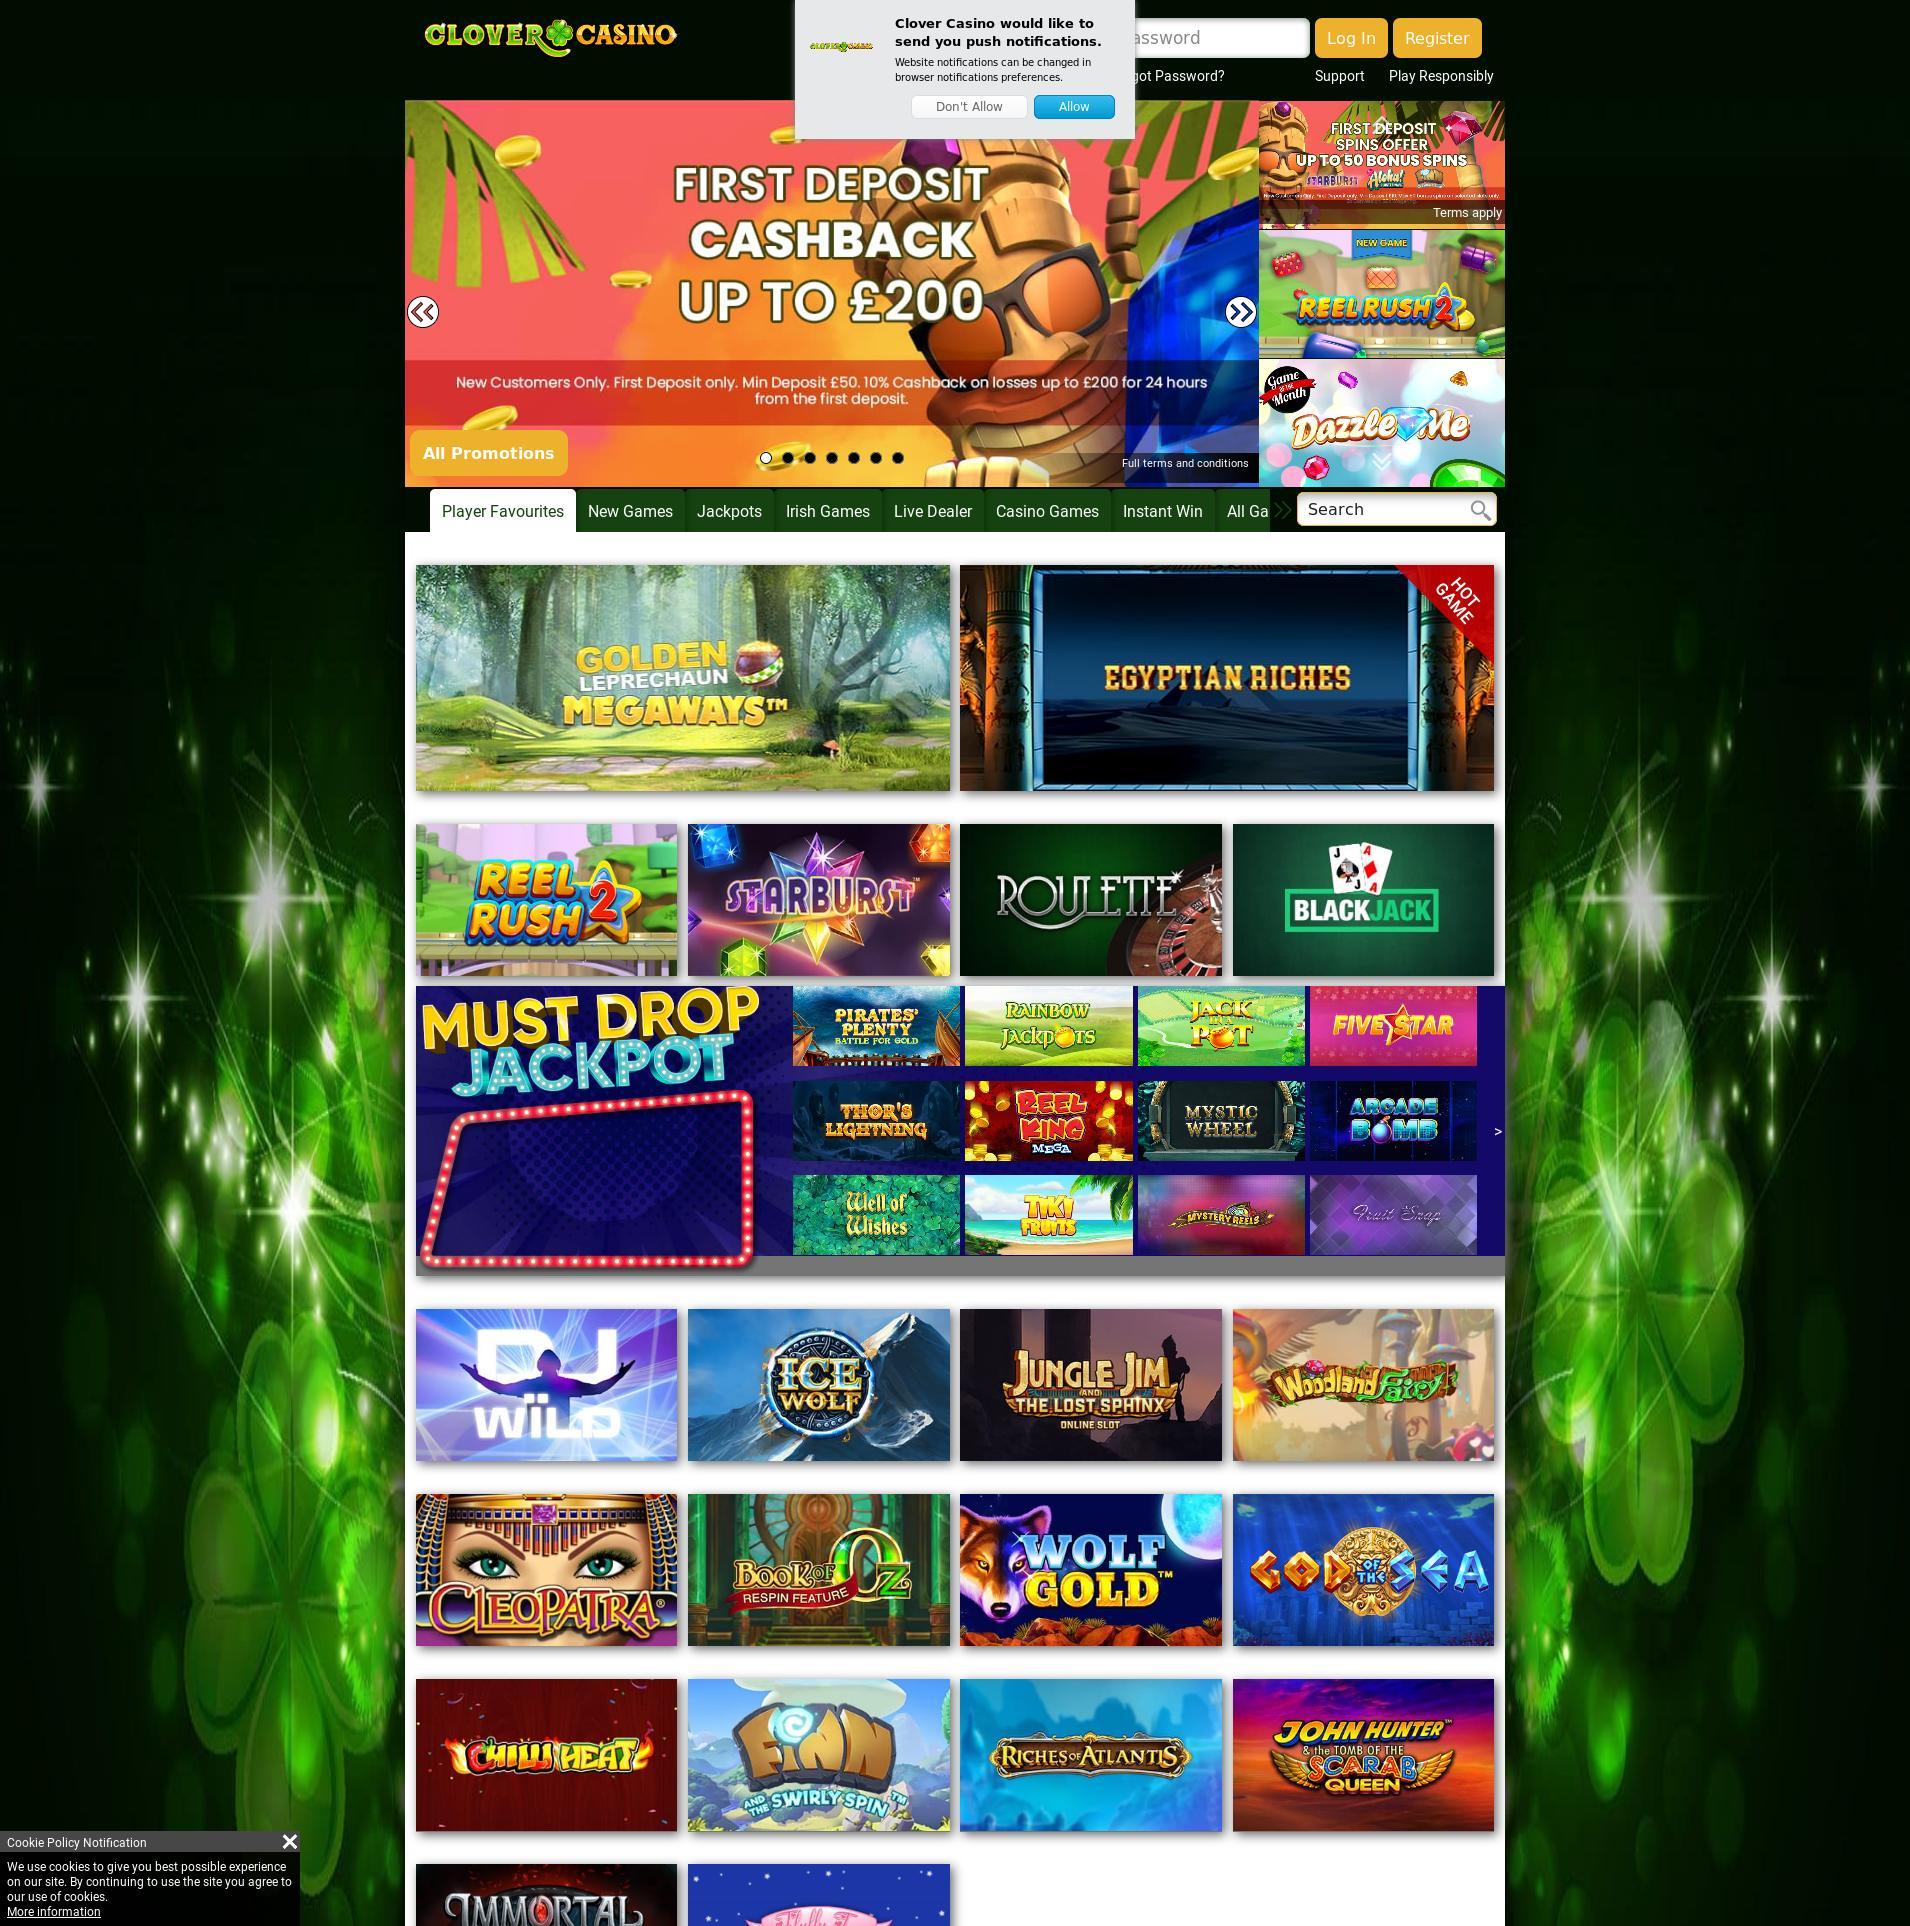 Casino screen Lobby 2019-11-21 for United Kingdom